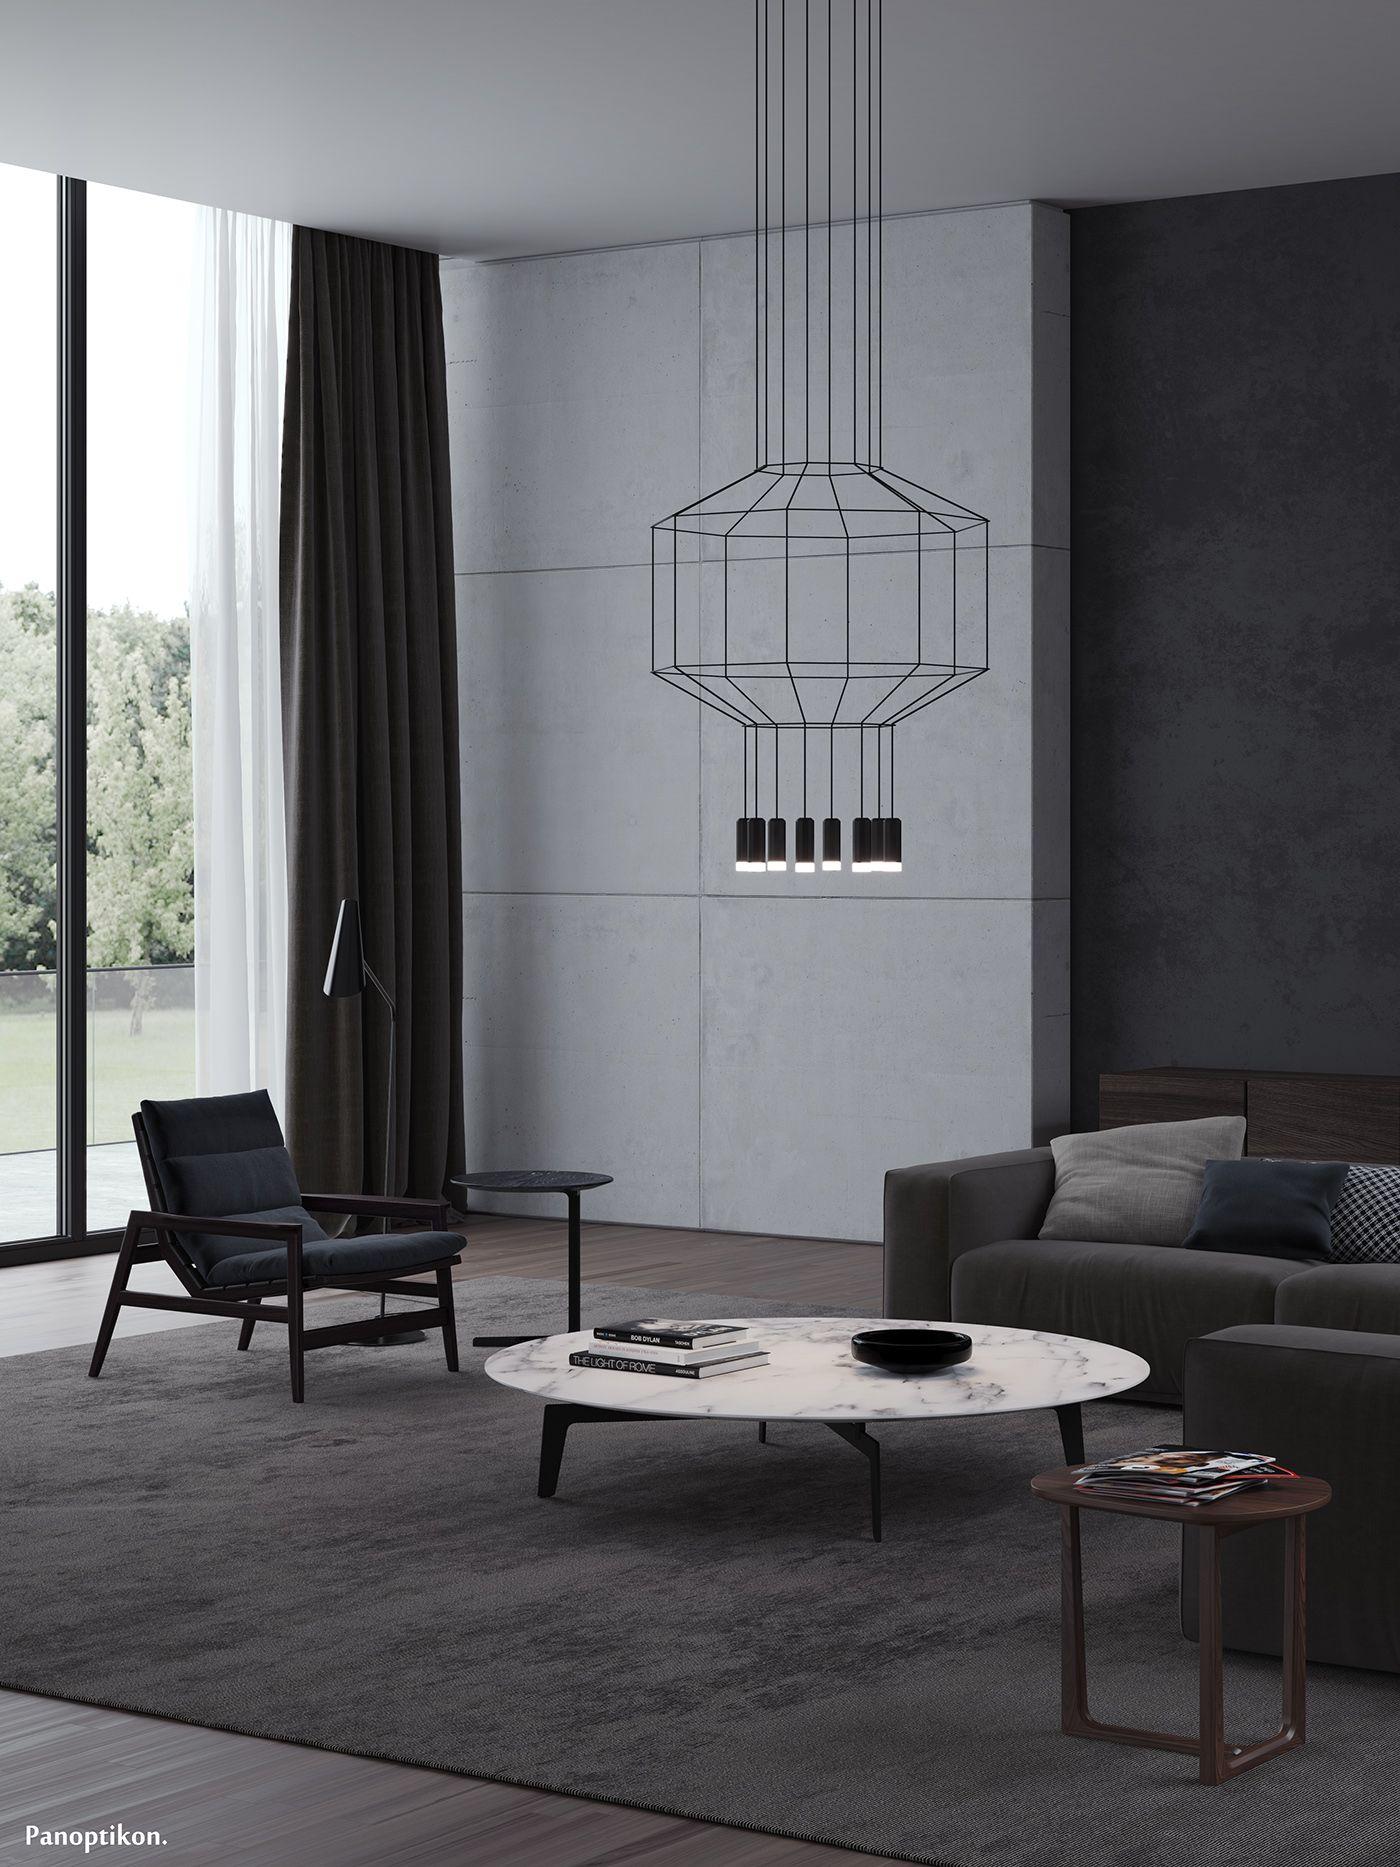 Modern Minimalist Living Room Design: Simple But Amazing Living Room Decor